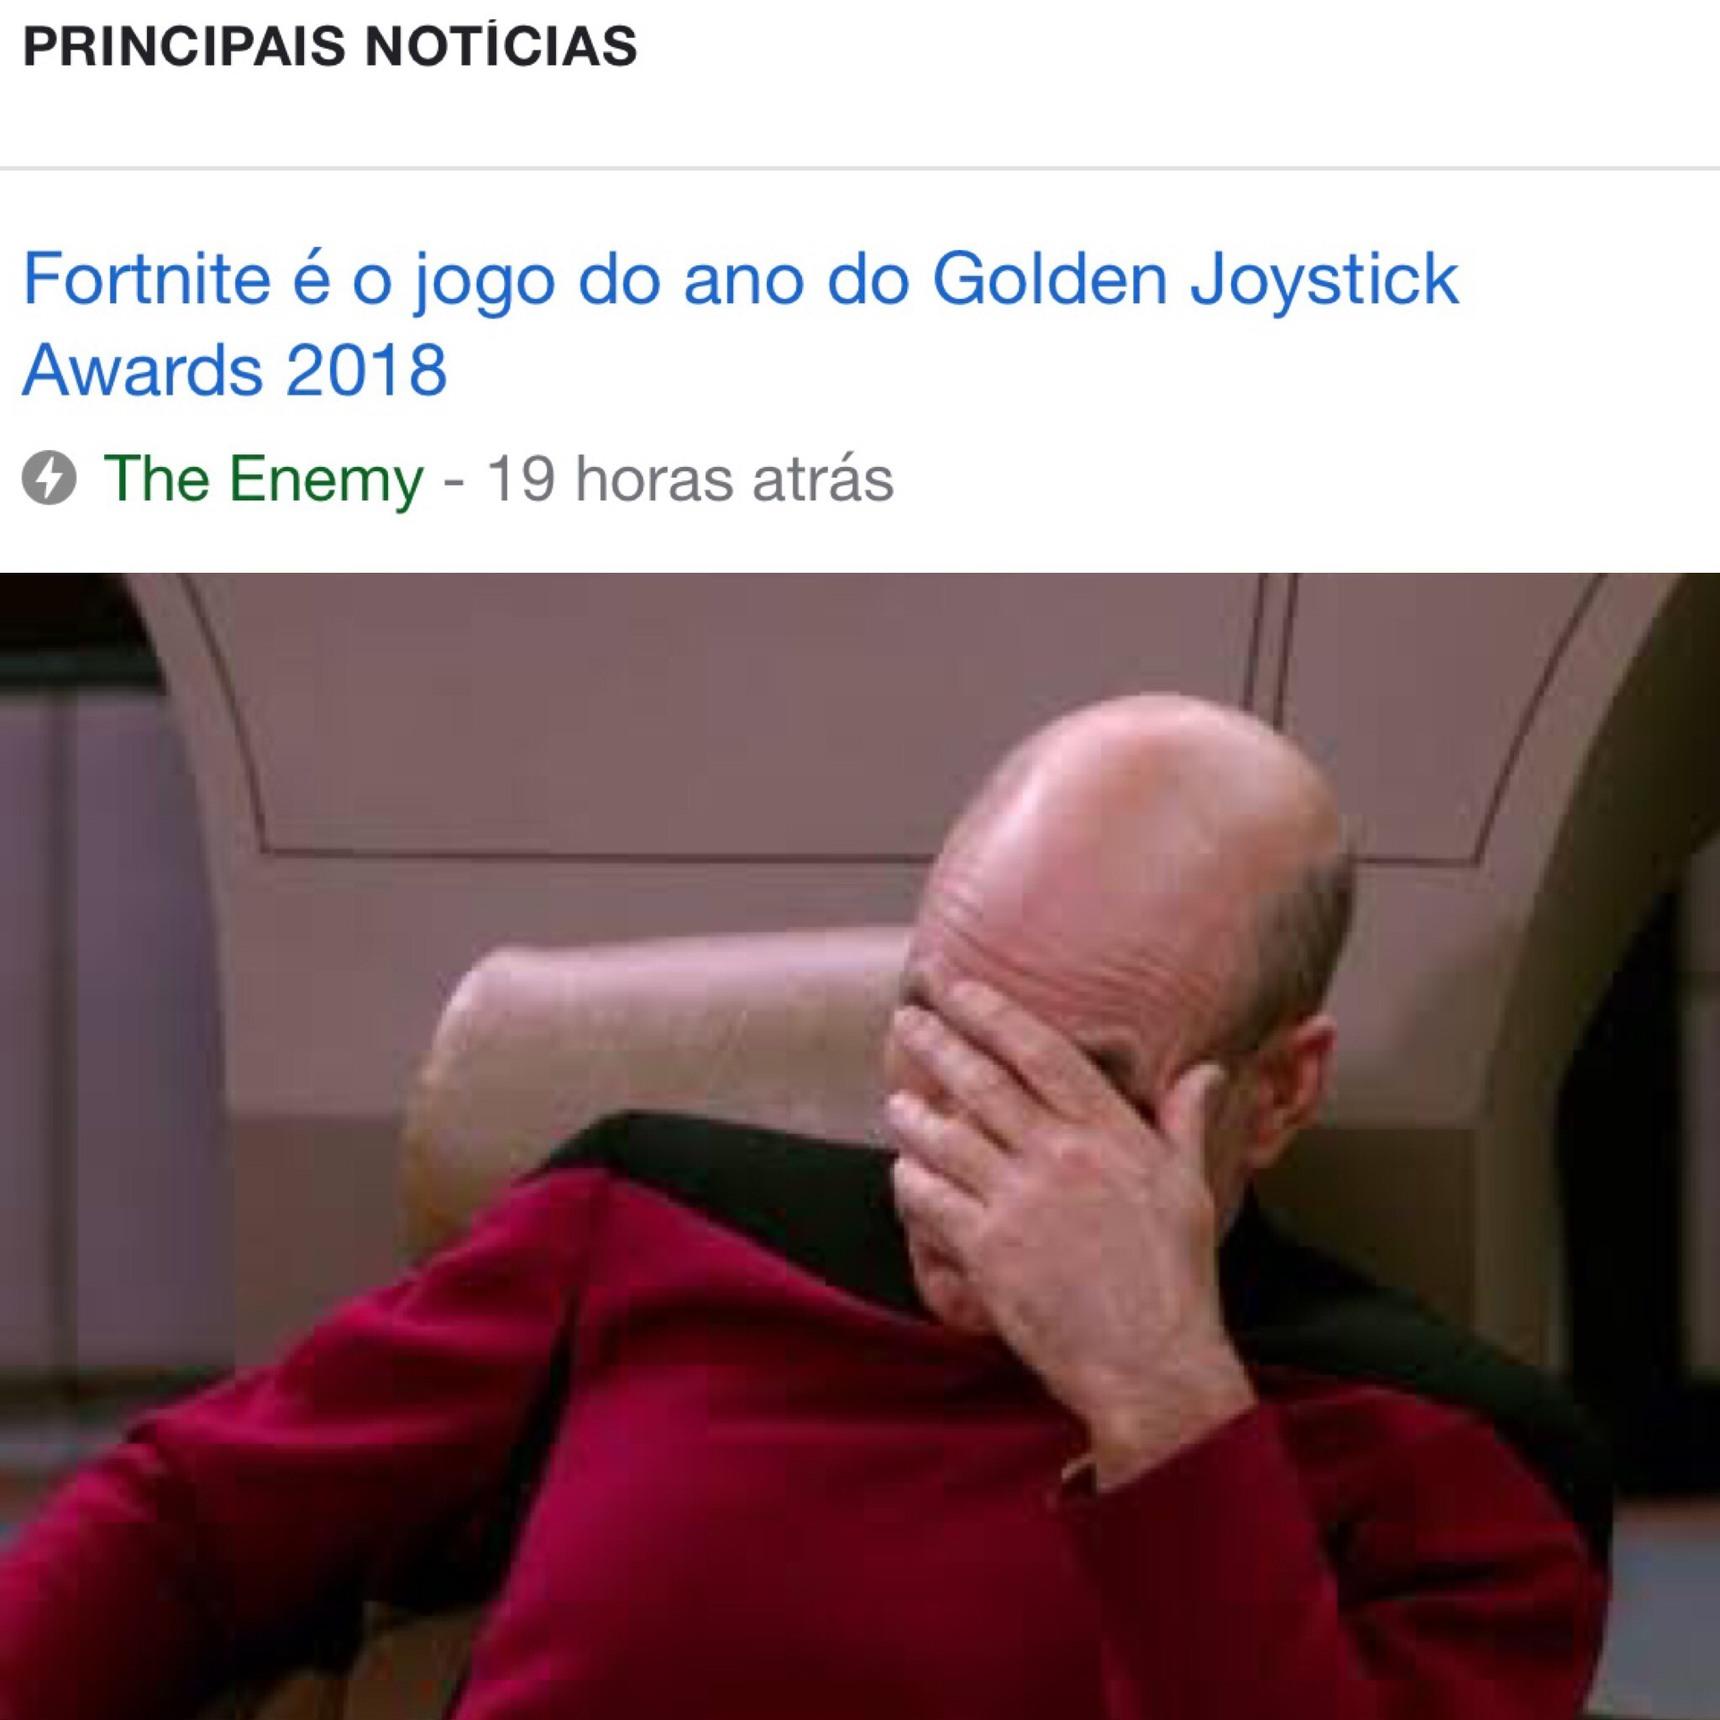 O título foi ser eleito O JOGO do ano - meme